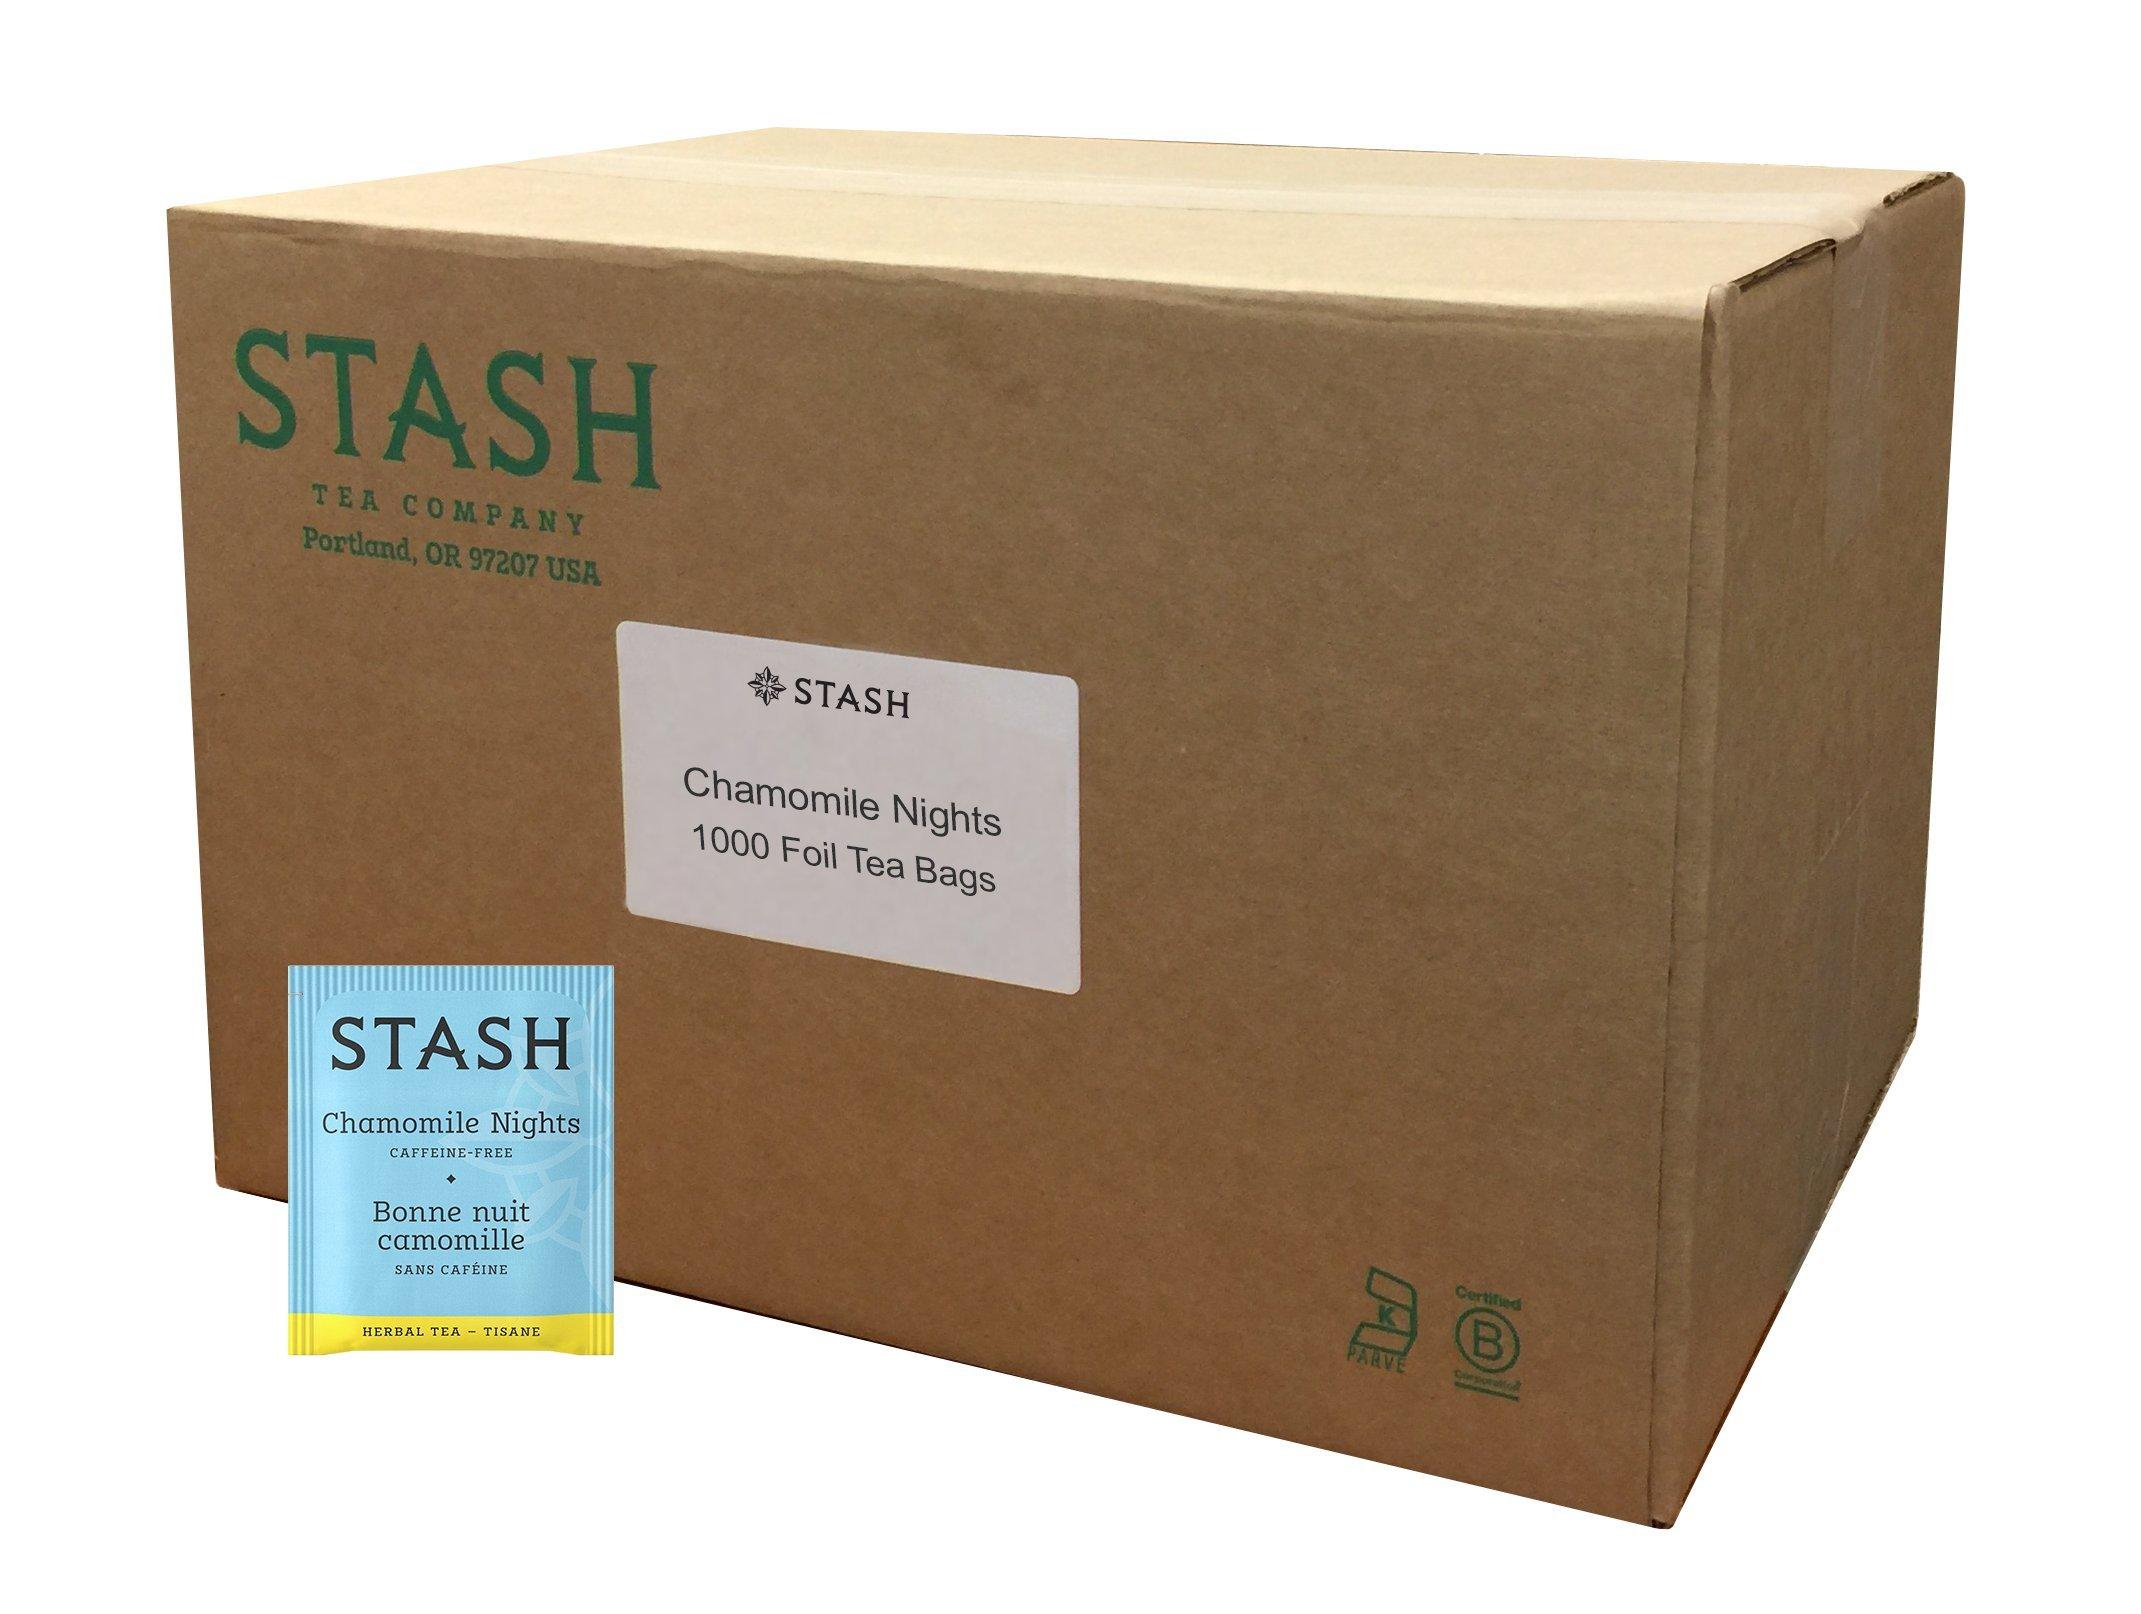 Stash Tea Chamomile Nights Herbal Tea 1000 Count Tea Bags in Foil (Packaging May Vary) Individual Herbal Tea Bags for Use in Teapots Mugs or Cups, Brew Hot Tea or Iced Tea